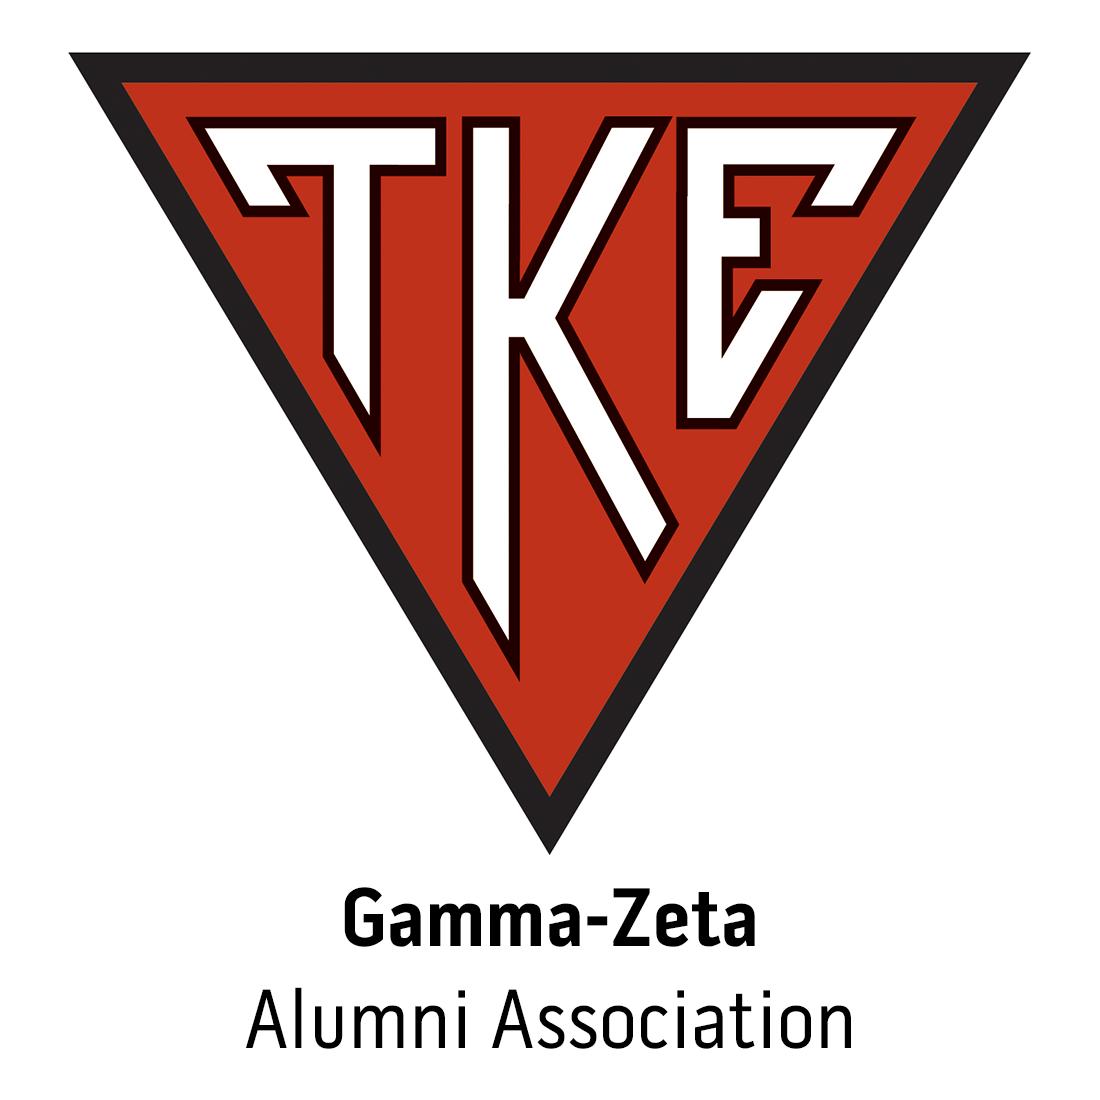 Gamma-Zeta Alumni Association at Hartwick College